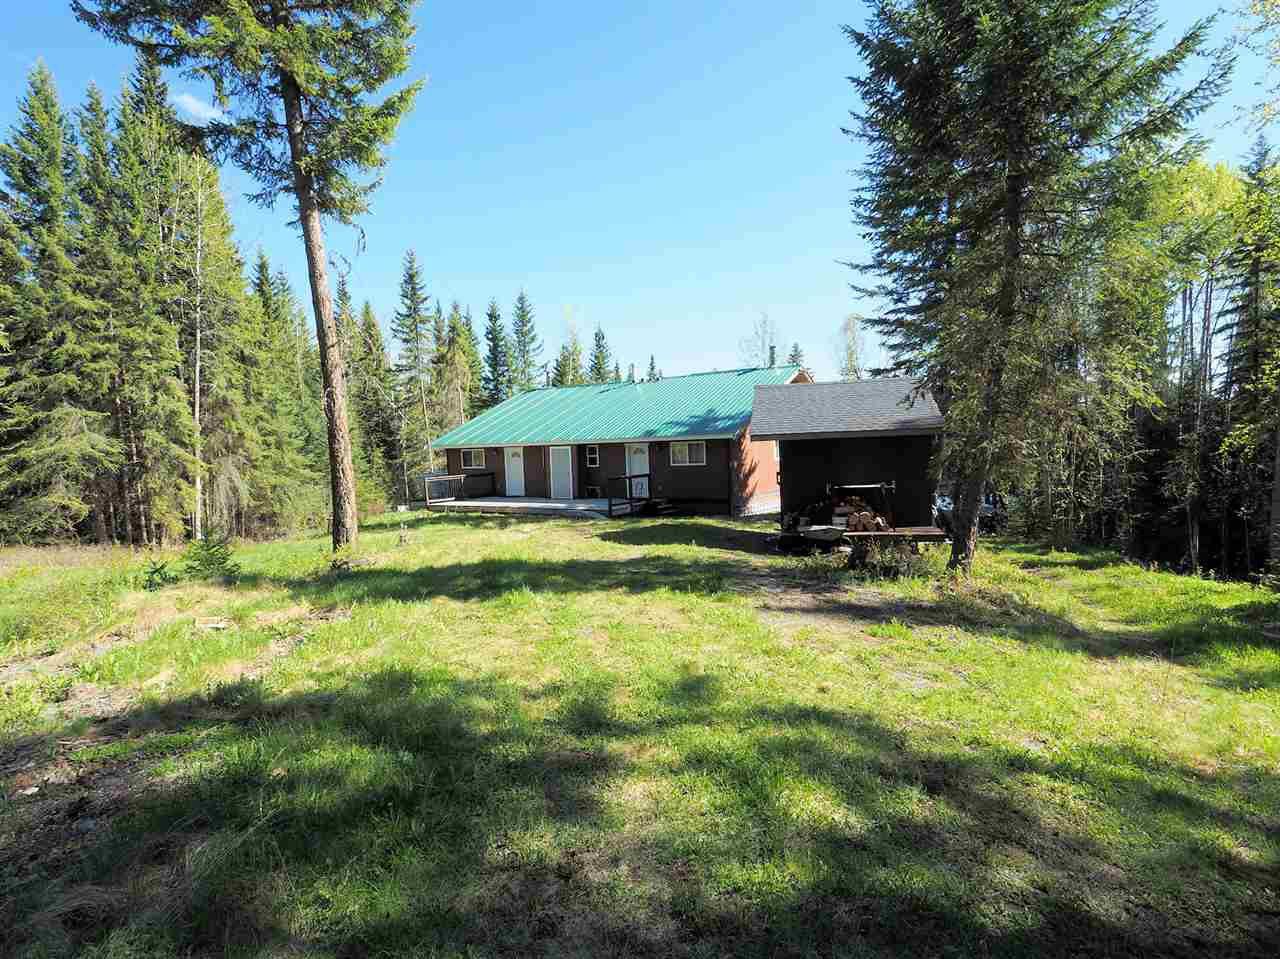 Photo 25: Photos: 8222 CENTENNIAL Road in Bridge Lake: Bridge Lake/Sheridan Lake House for sale (100 Mile House (Zone 10))  : MLS®# R2457362